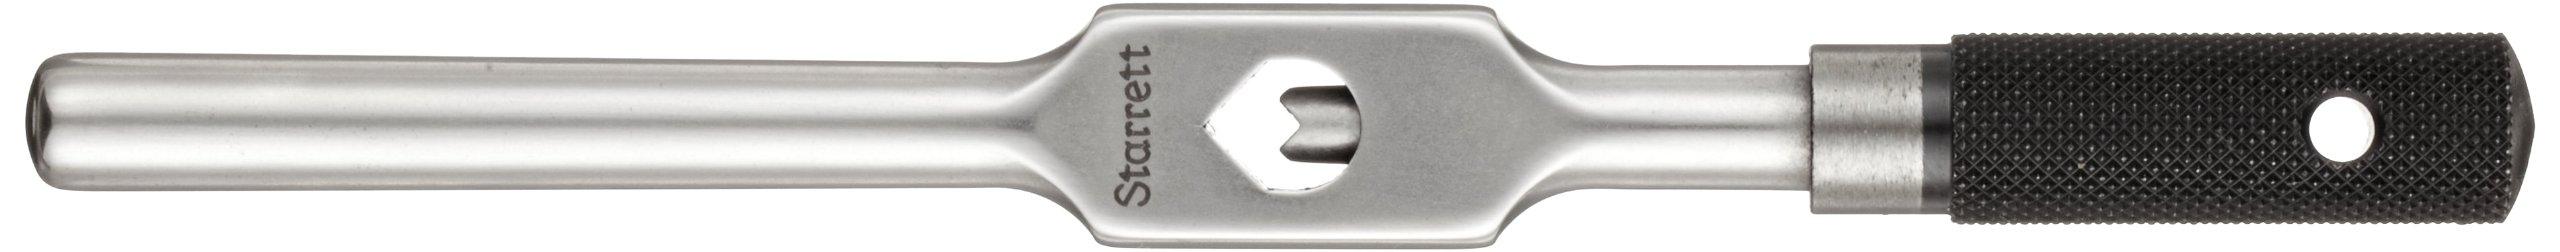 Starrett 91B Tap Wrench, 3/16'' - 1/2'' Tap Size, 5/32'' - 9/32'' Square Shank Diameter, 9'' Body Length by Starrett